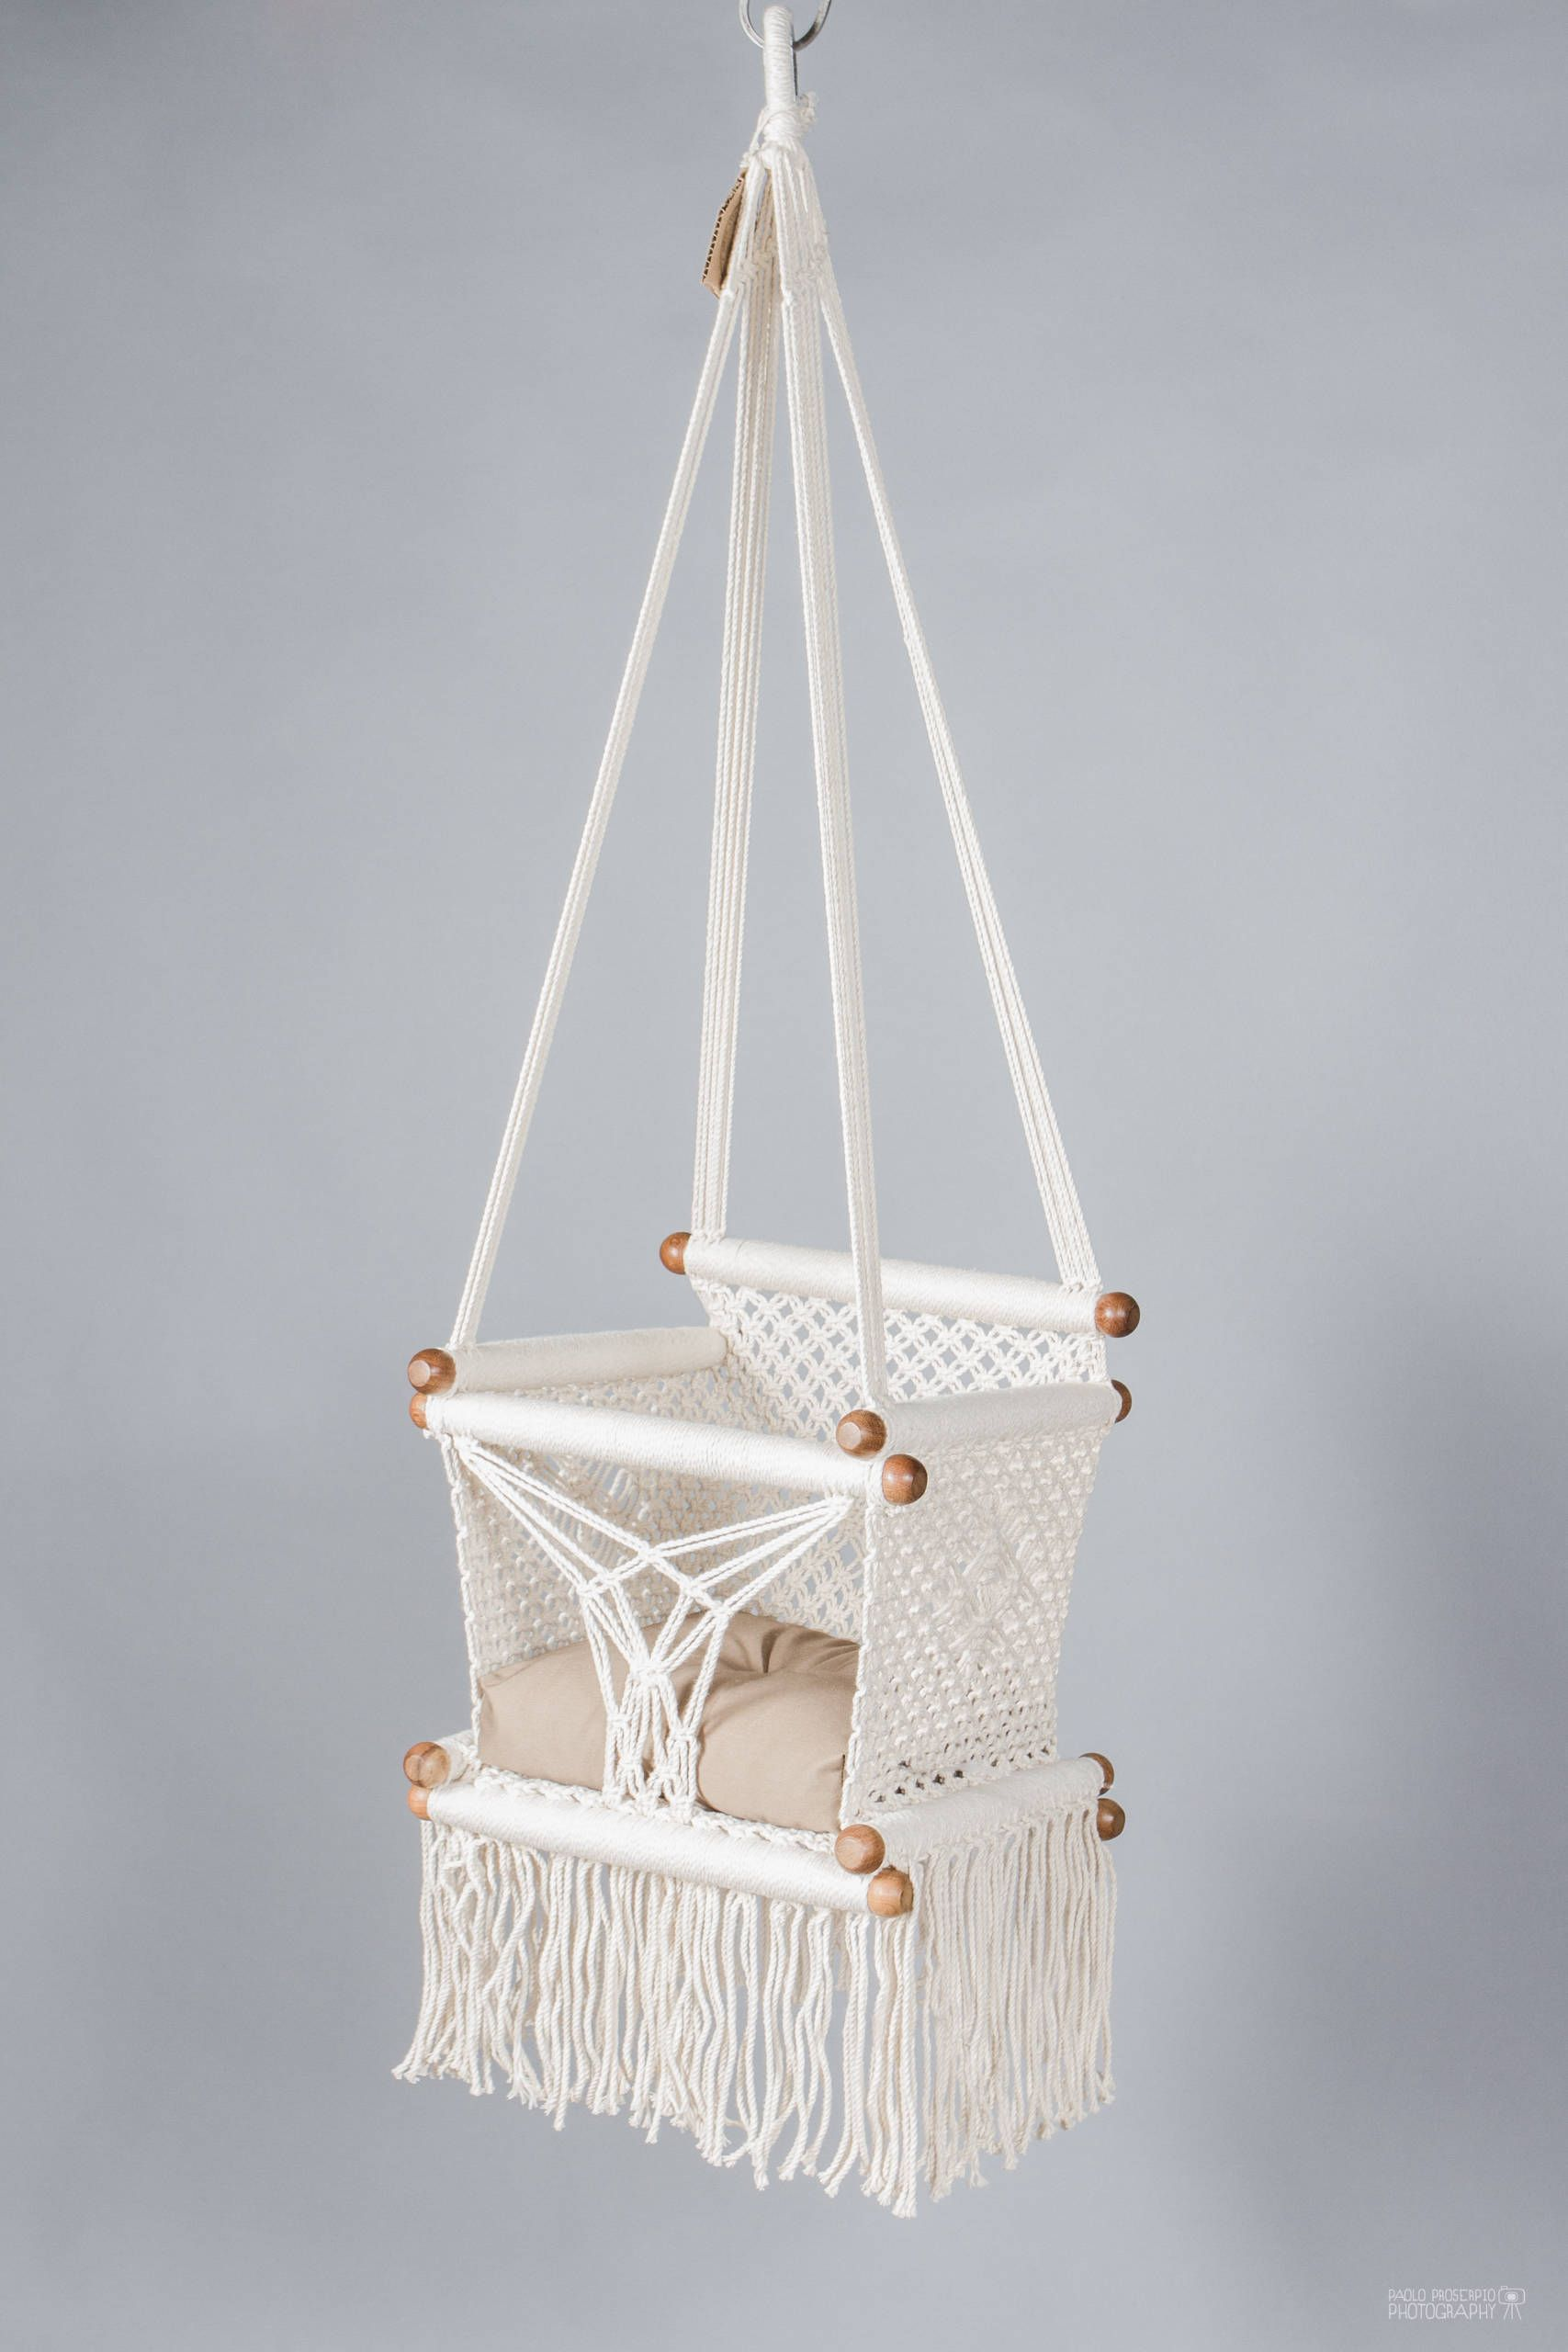 Baby Swing Chair In Macrame Made In Cream Color Cotton And Etsy Baby Swing Chair Swinging Chair Macrame Swing